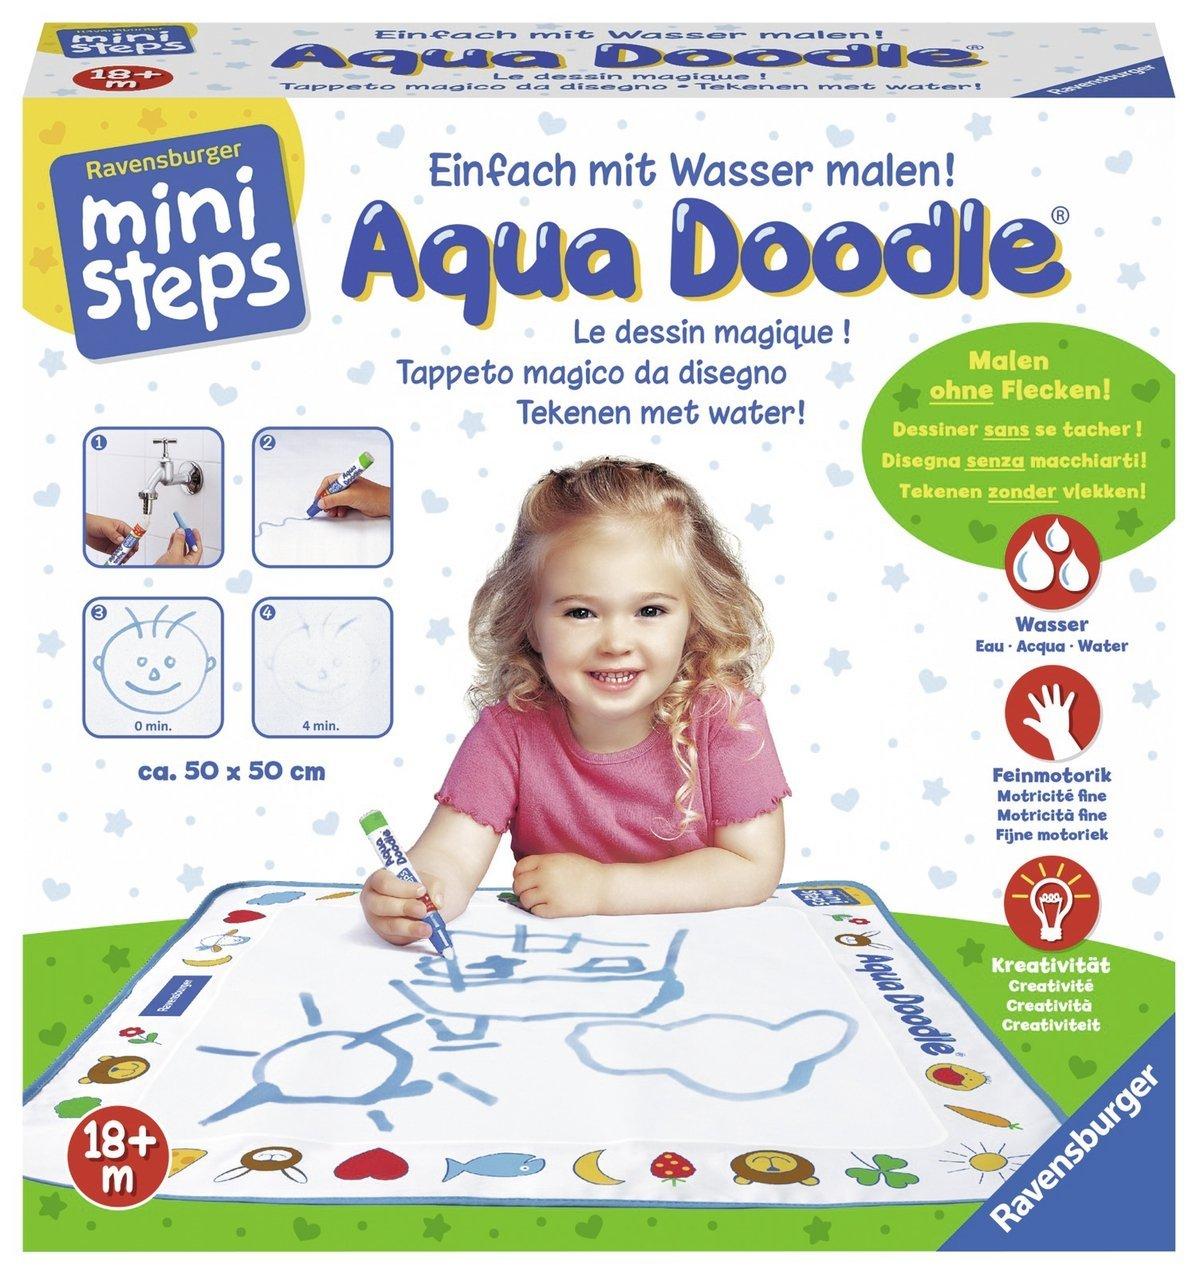 Ravensburger 04489 - ministeps Aqua Doodle @ Amazon Prime